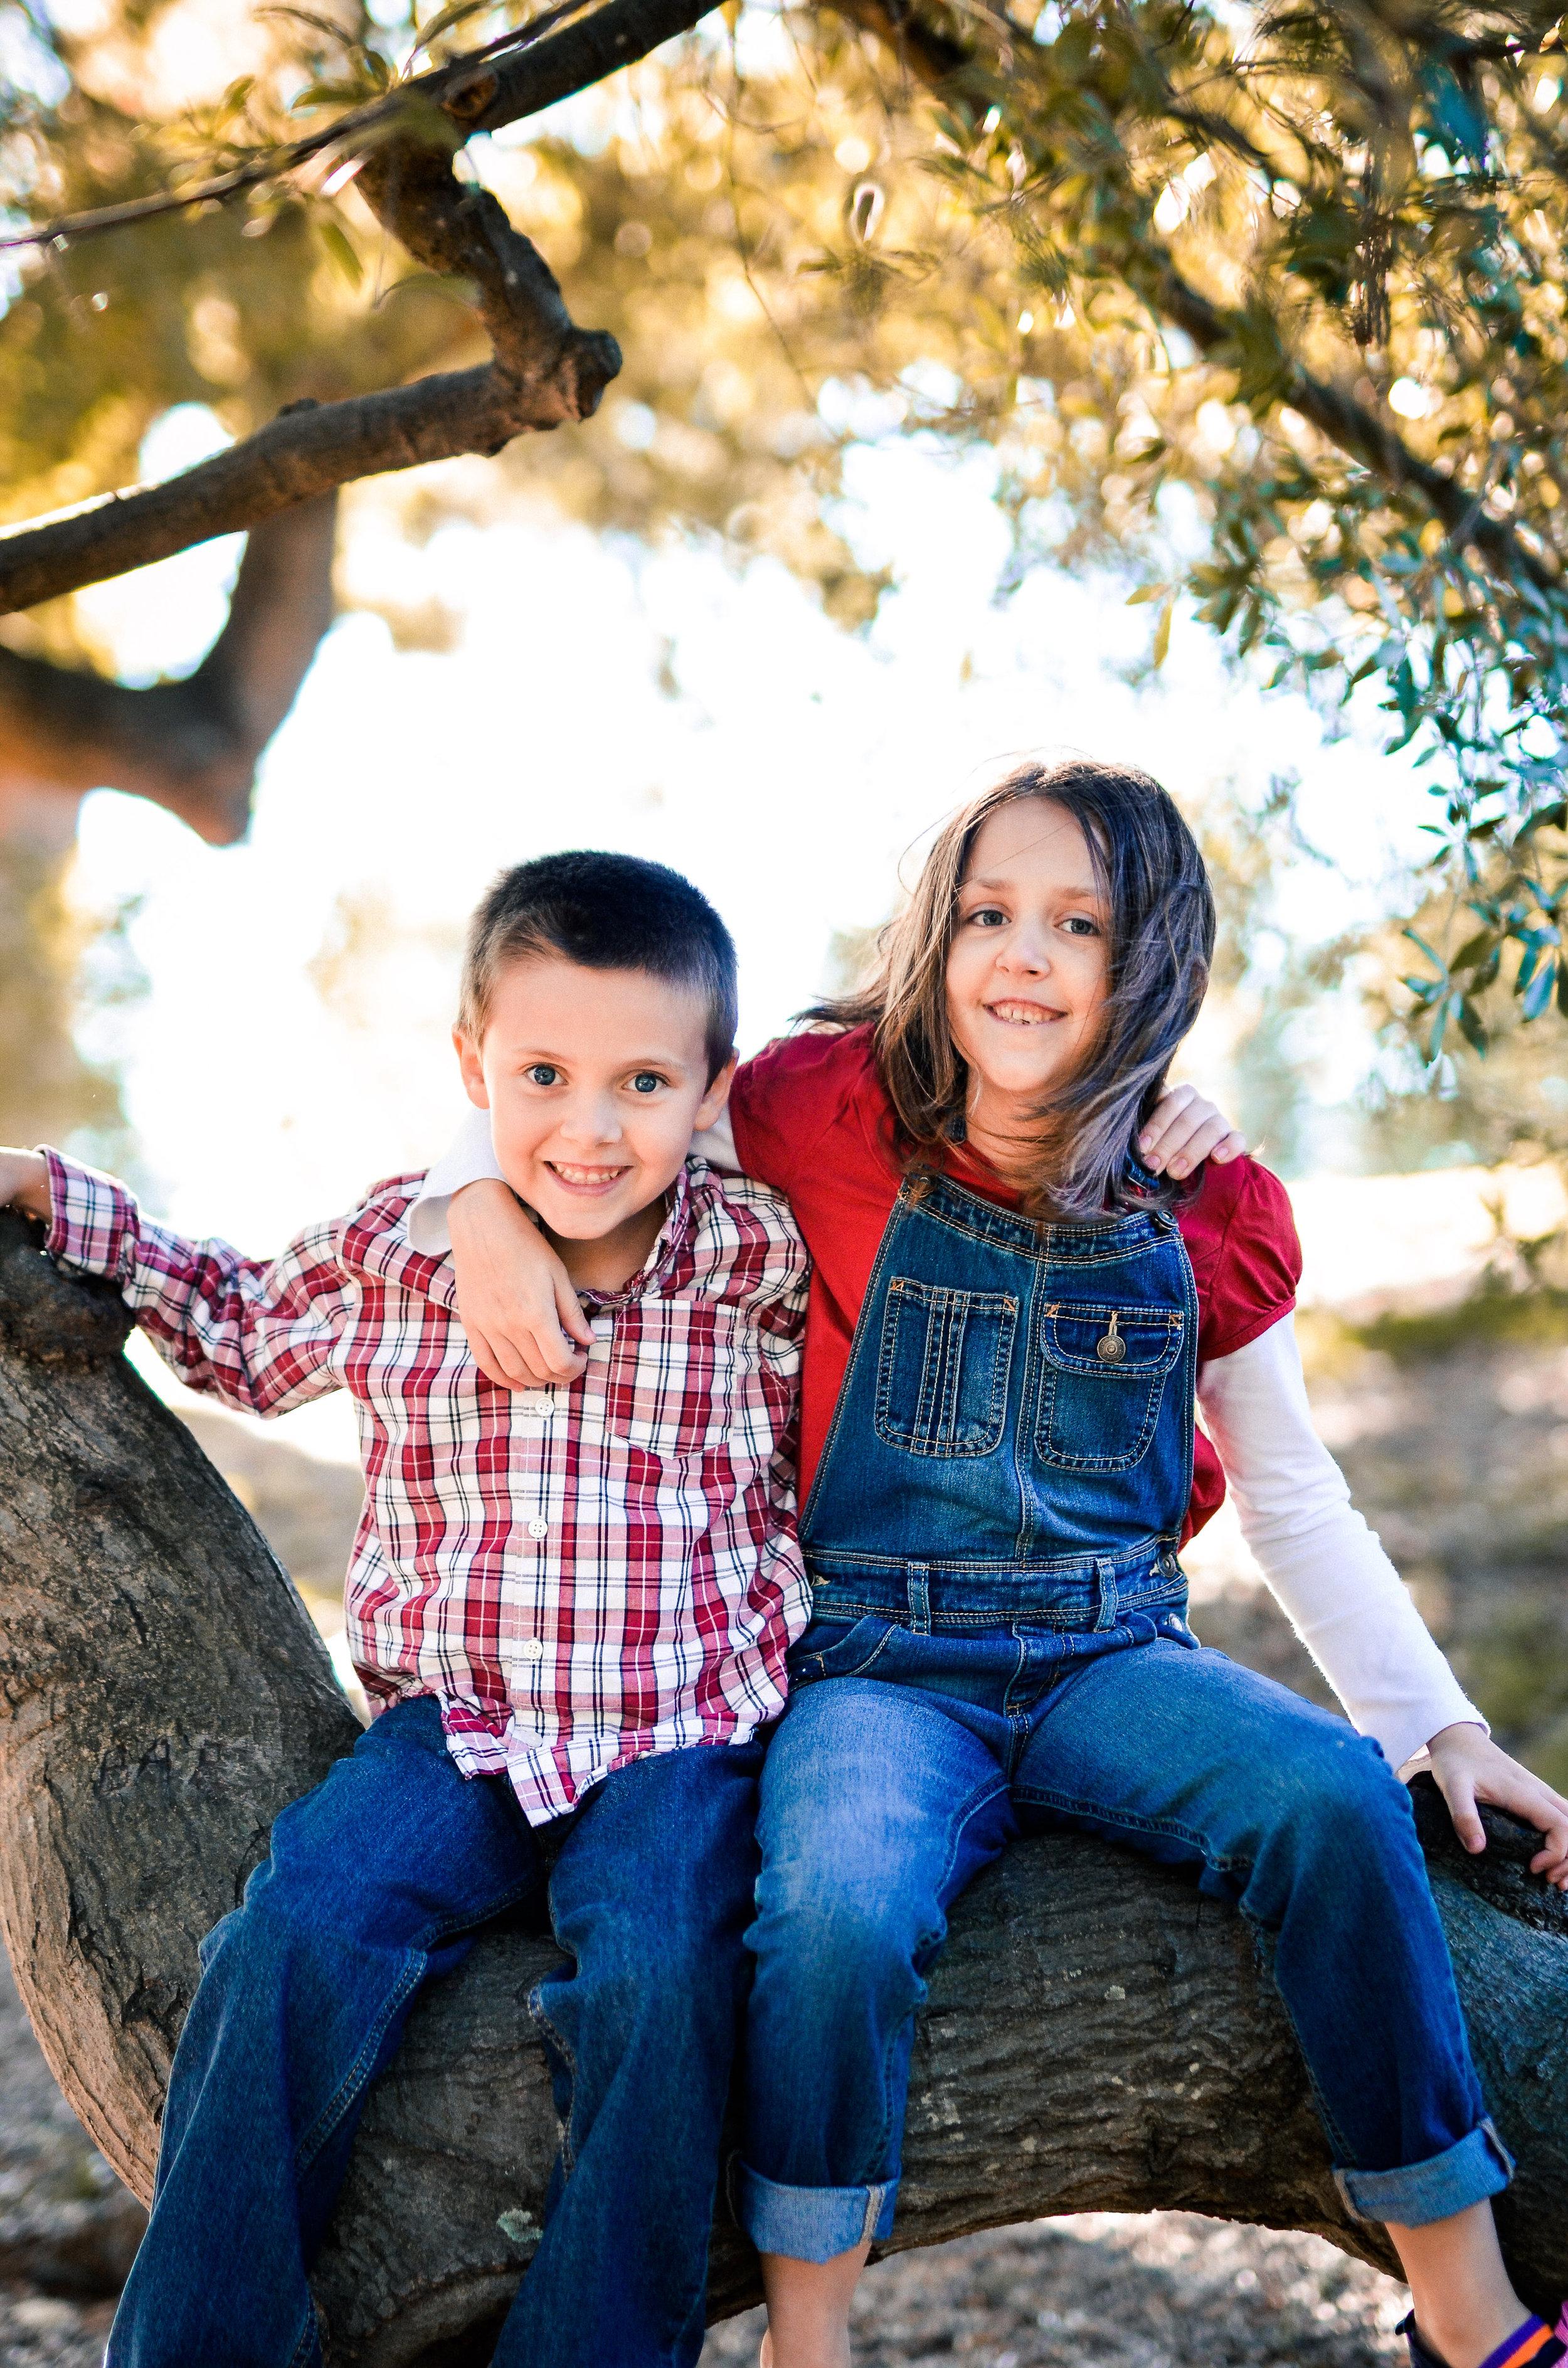 connorsfamily-0854betterheads.jpg